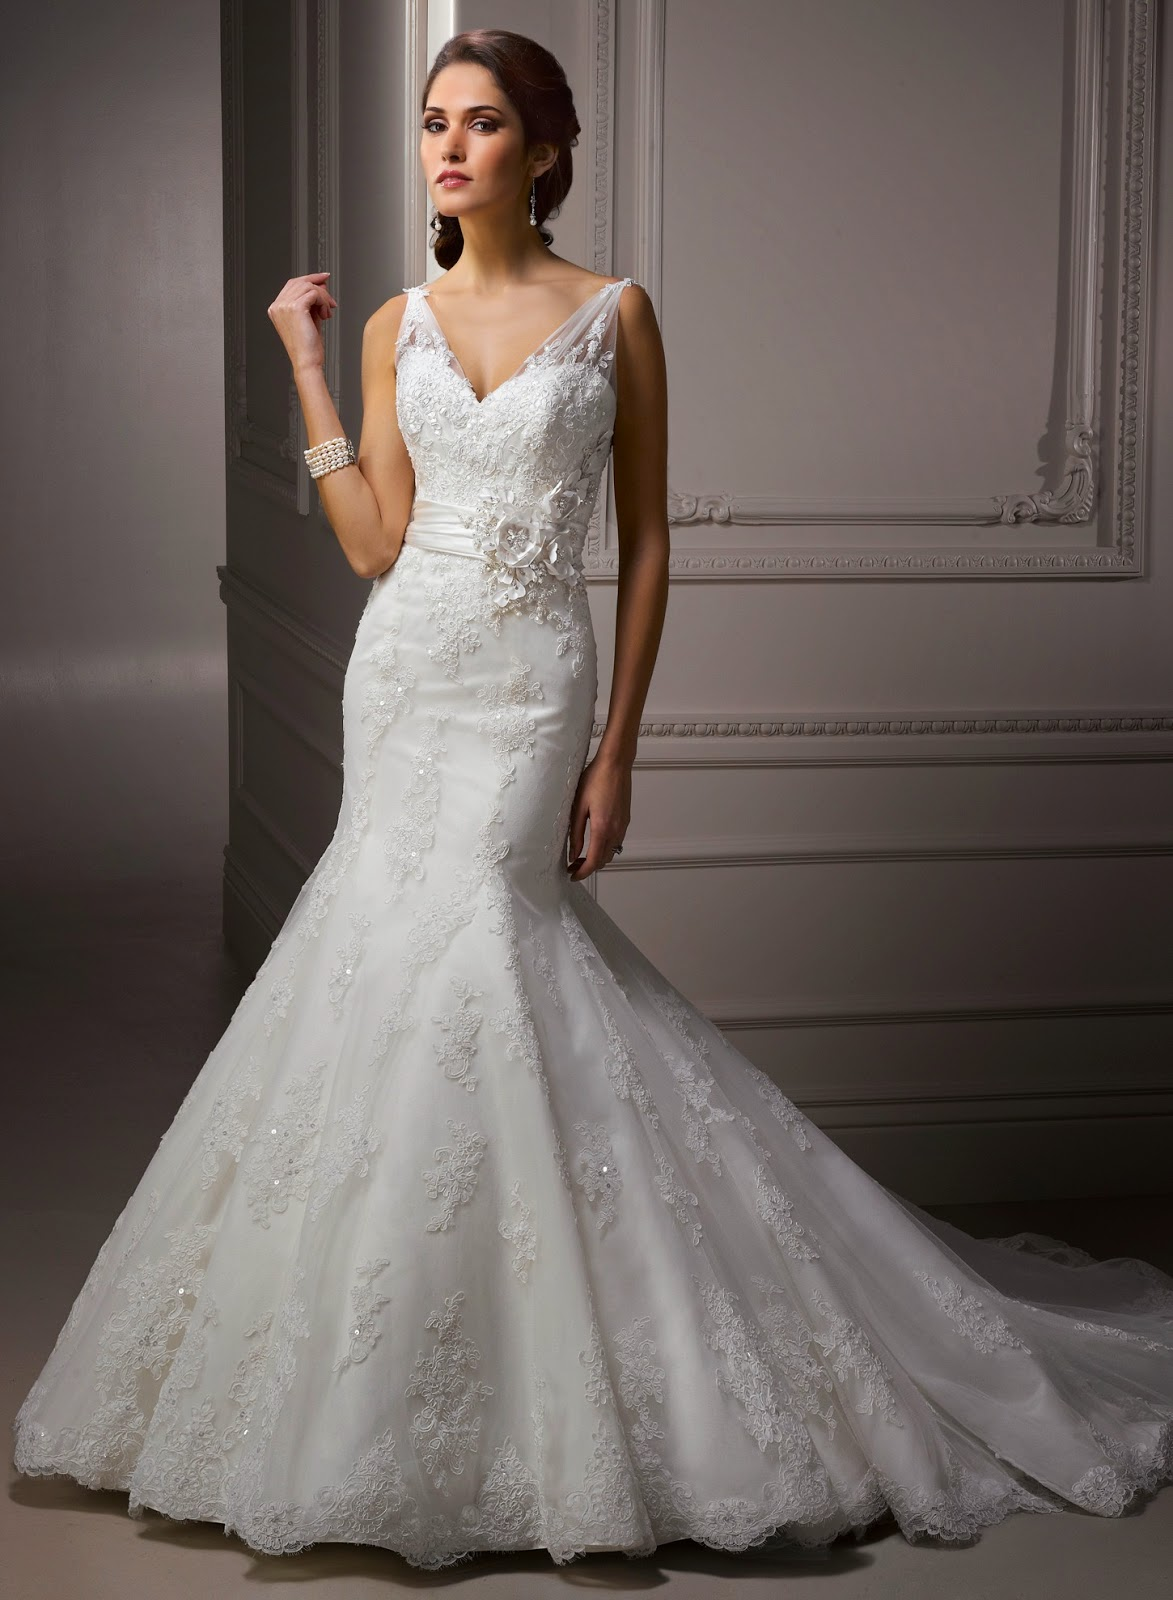 wedding dress rental wedding dresses for rent wedding dress rent ocodeacom inspiring wedding dress rental nj pictures ideas wedding dress rent